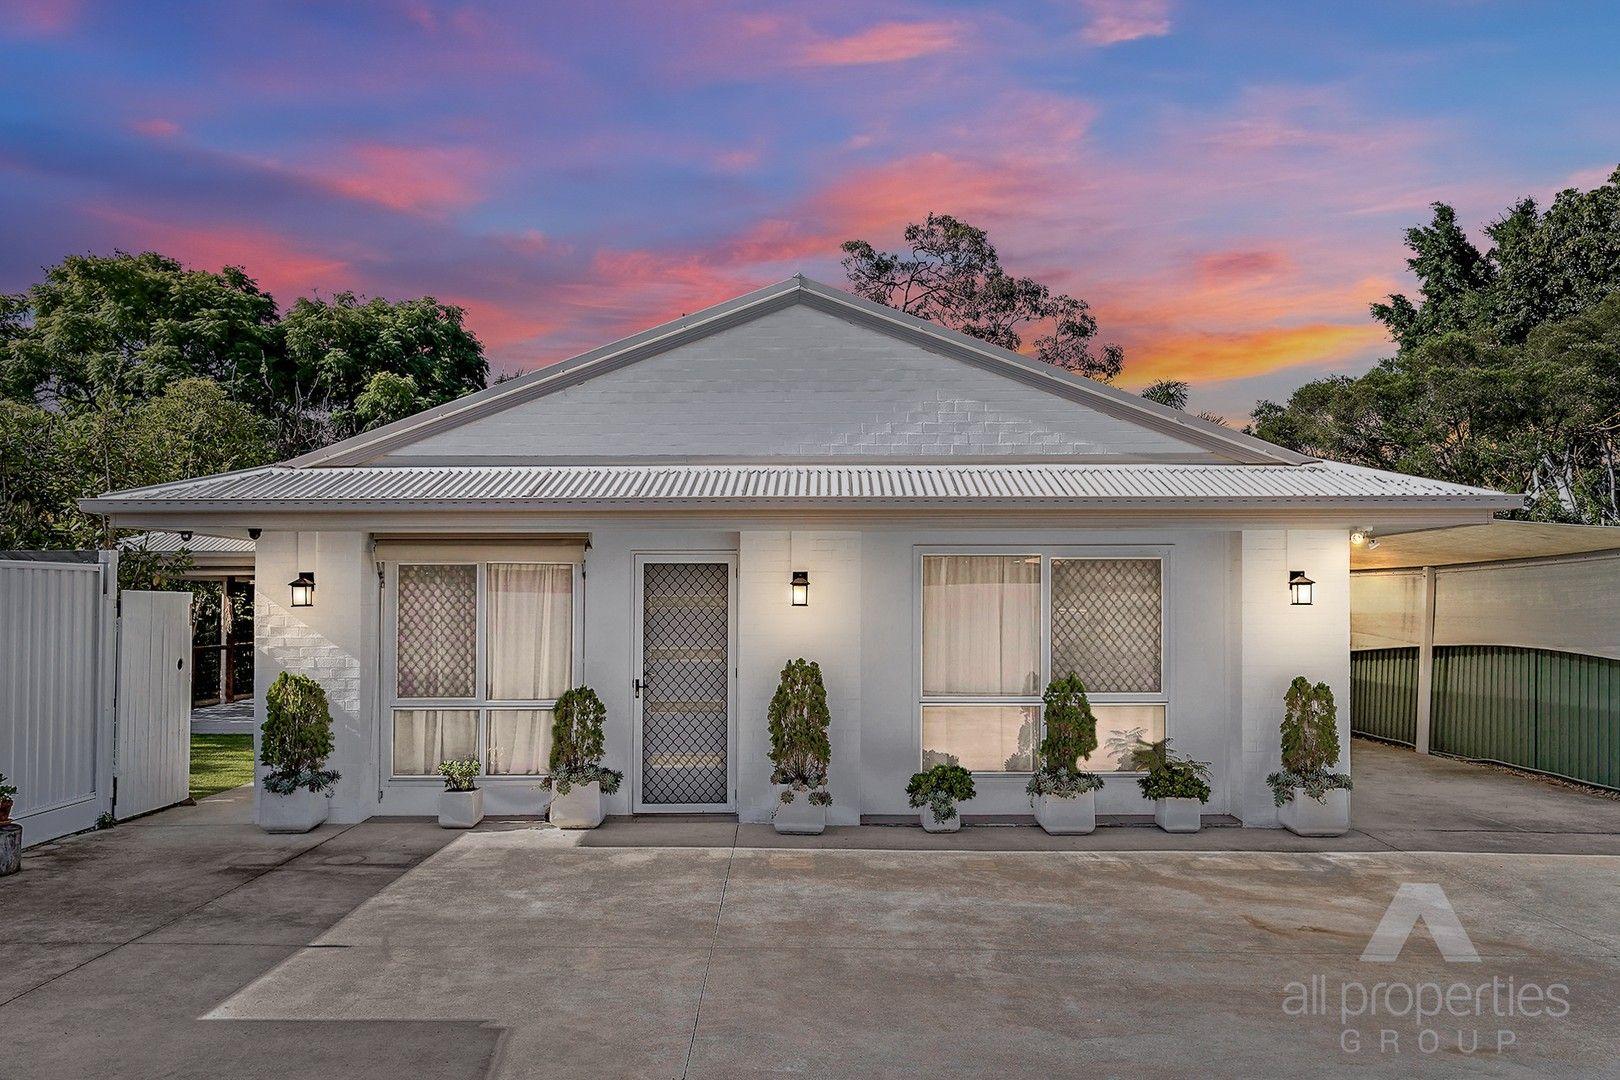 20 Cresthill Avenue, Regents Park QLD 4118, Image 0